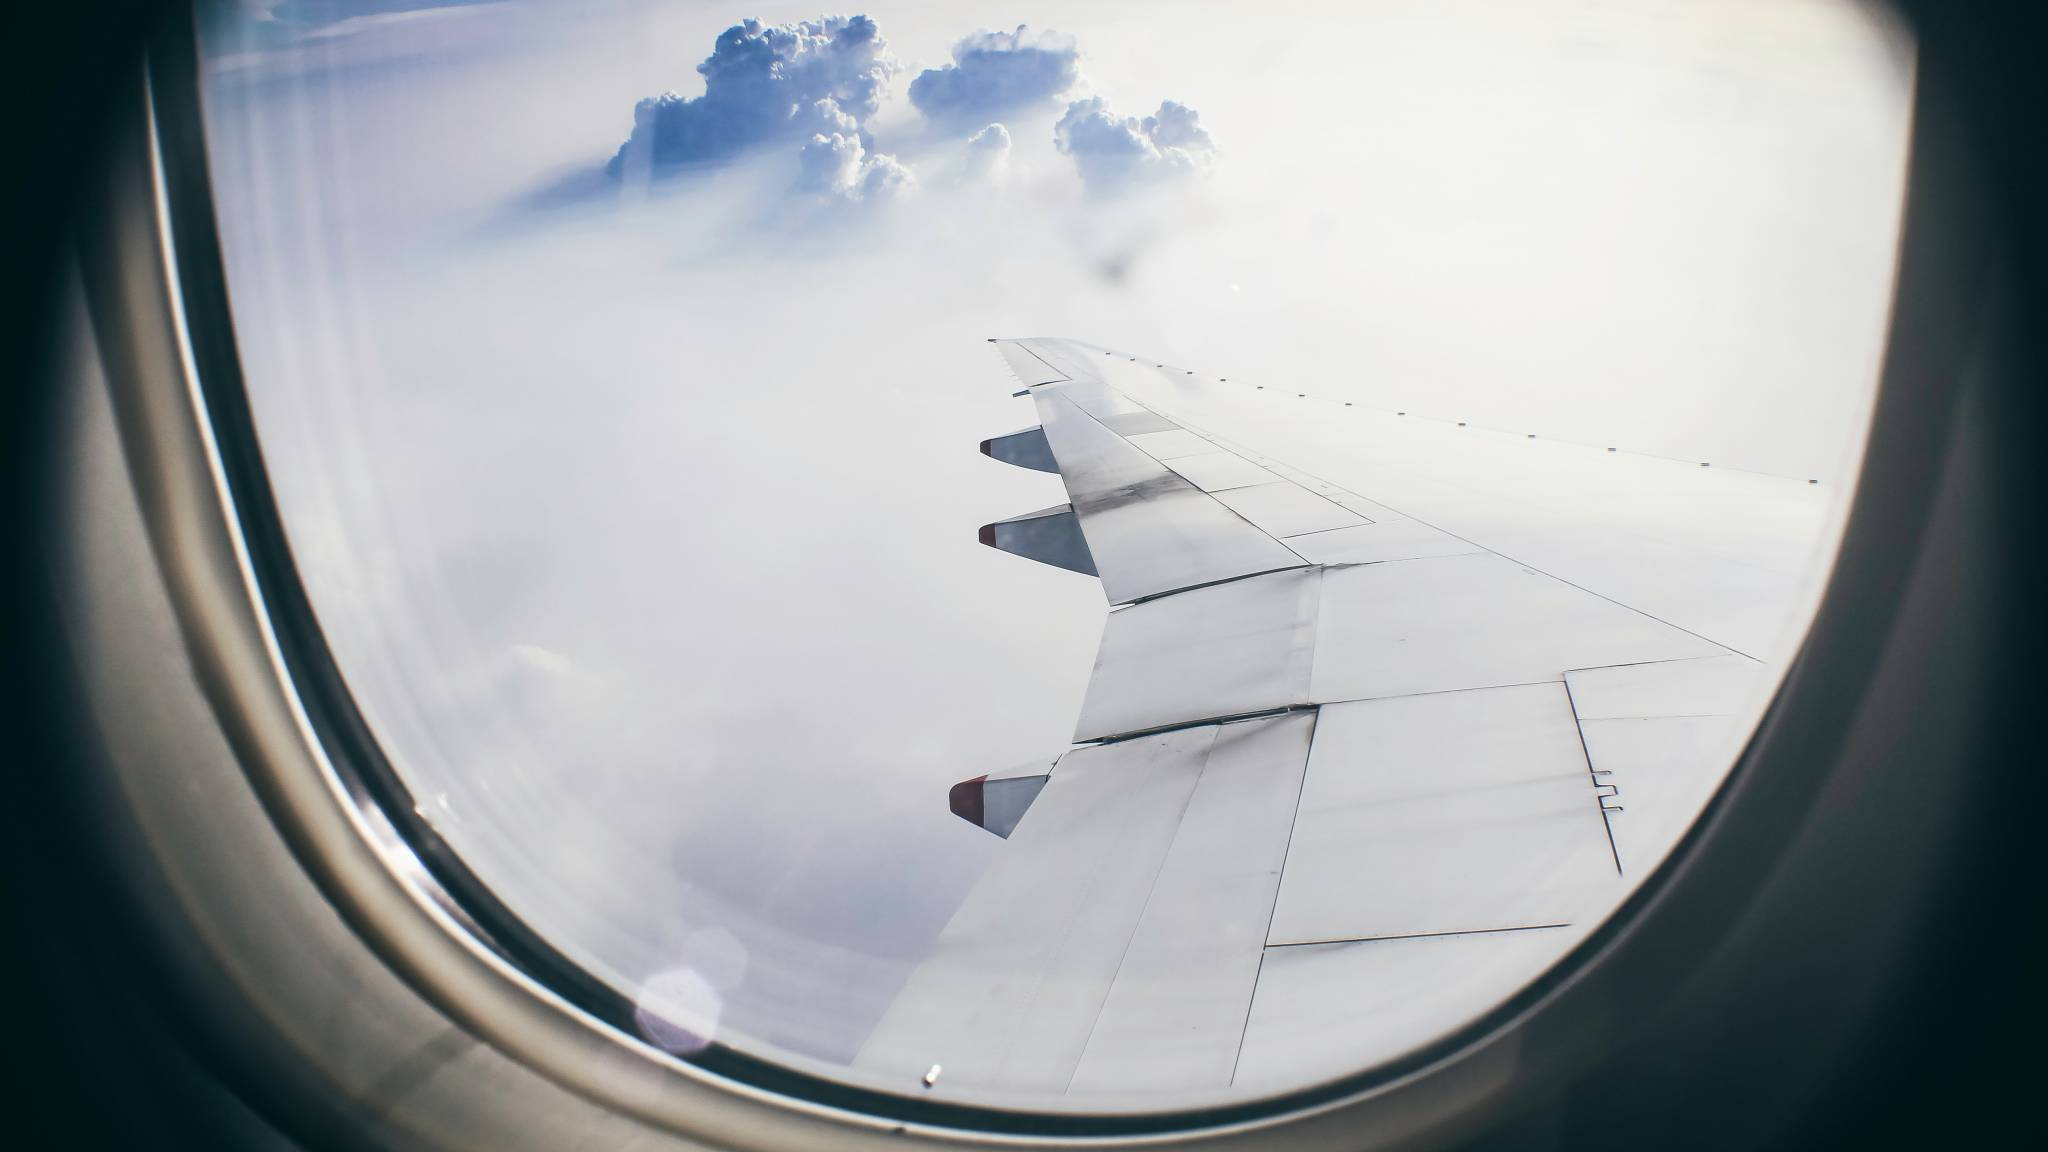 United Airlines MileagePlus Program: Comprehensive Guide